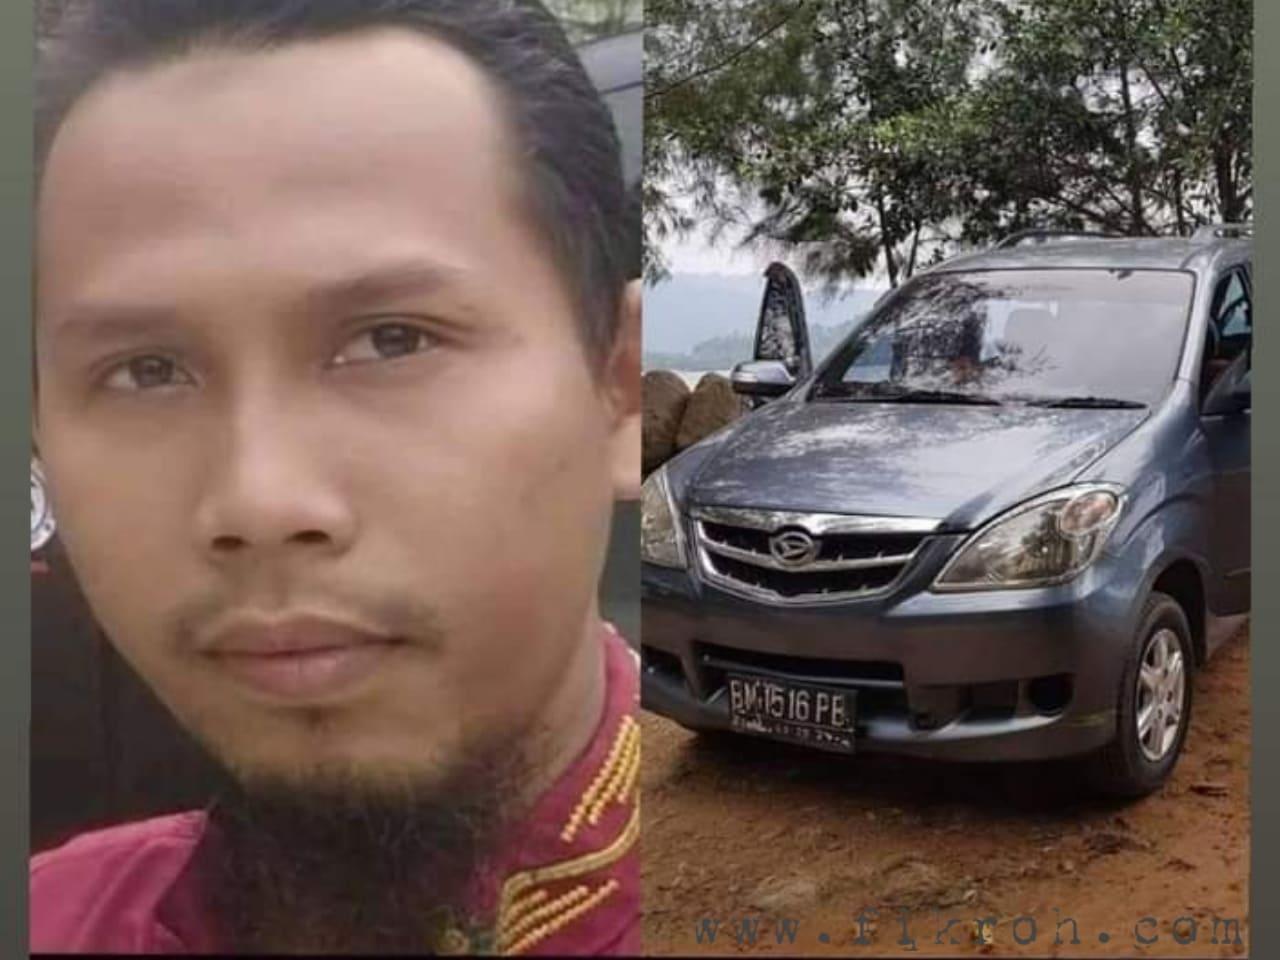 Kabar Hilangnya Muhammad Al Hadar Viral di Medsos, Keluarga Mengkonfirmasi Telah Meninggal Dunia